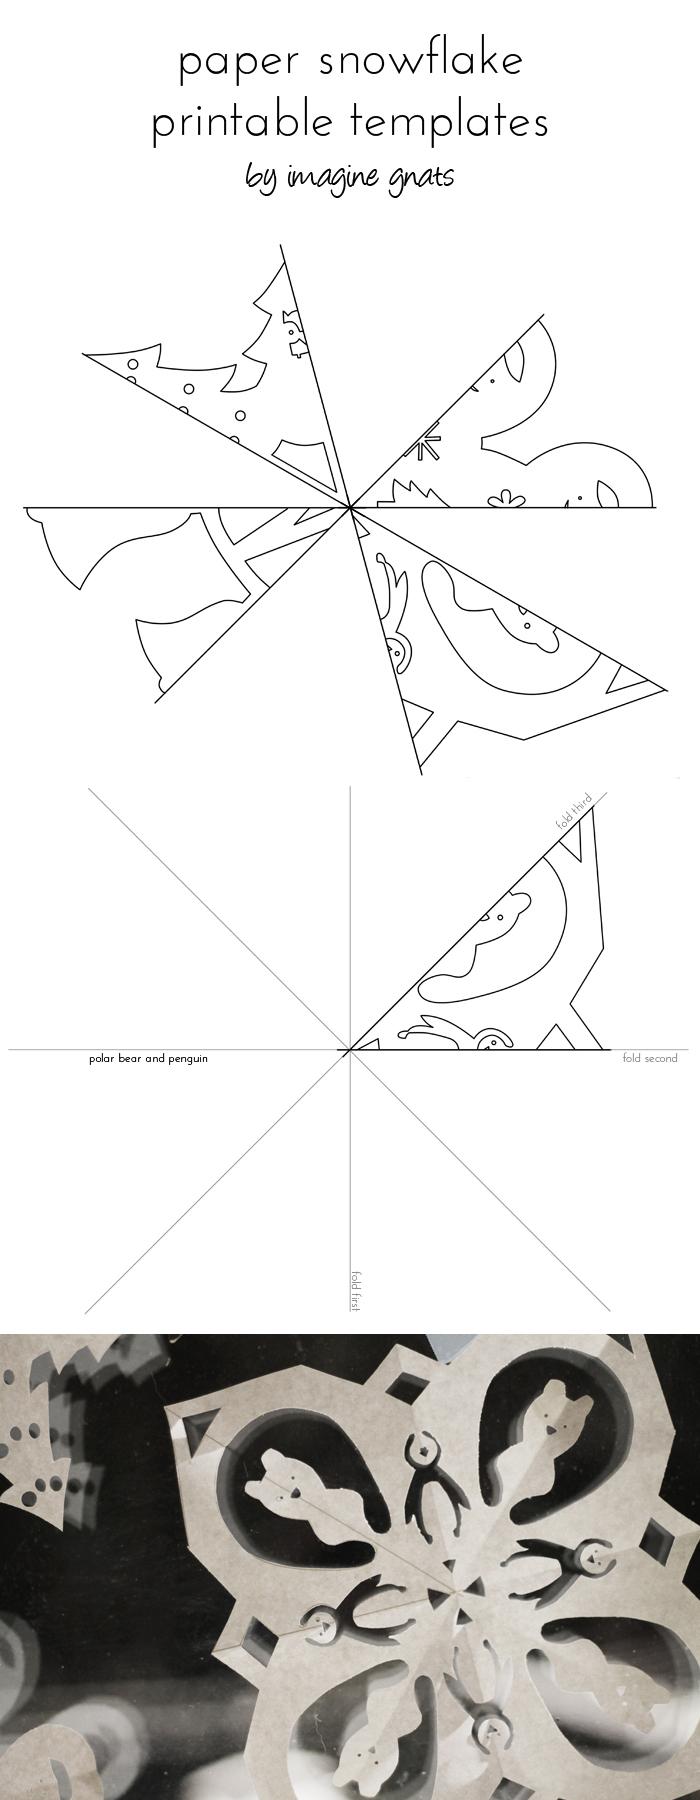 Free Printable: Paper Snowflakes - Imagine Gnats - Snowflake Template Free Printable